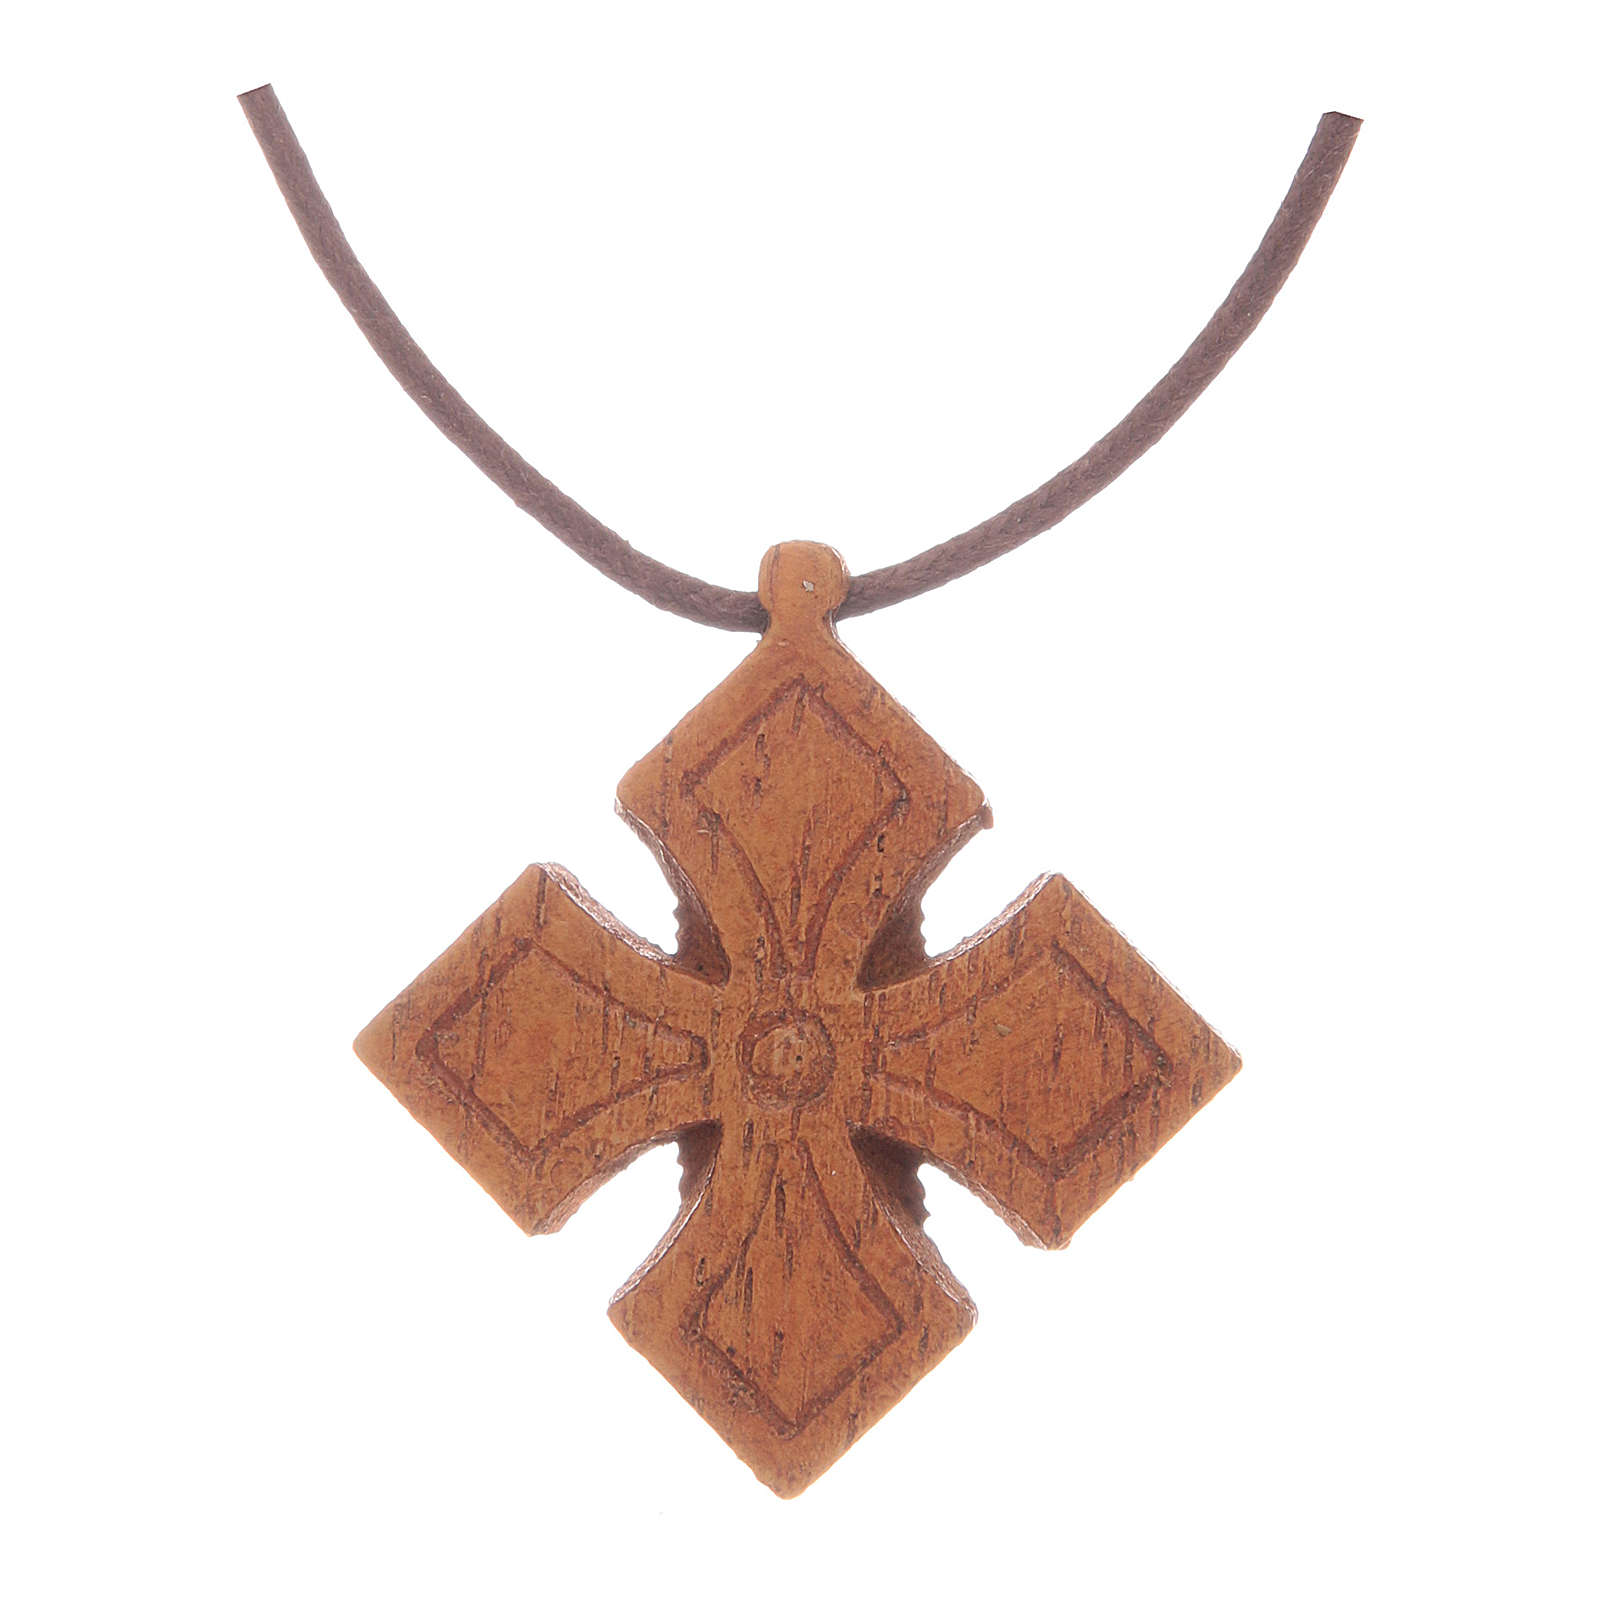 Kreuz Anhängher aus Holz Bethleem 4